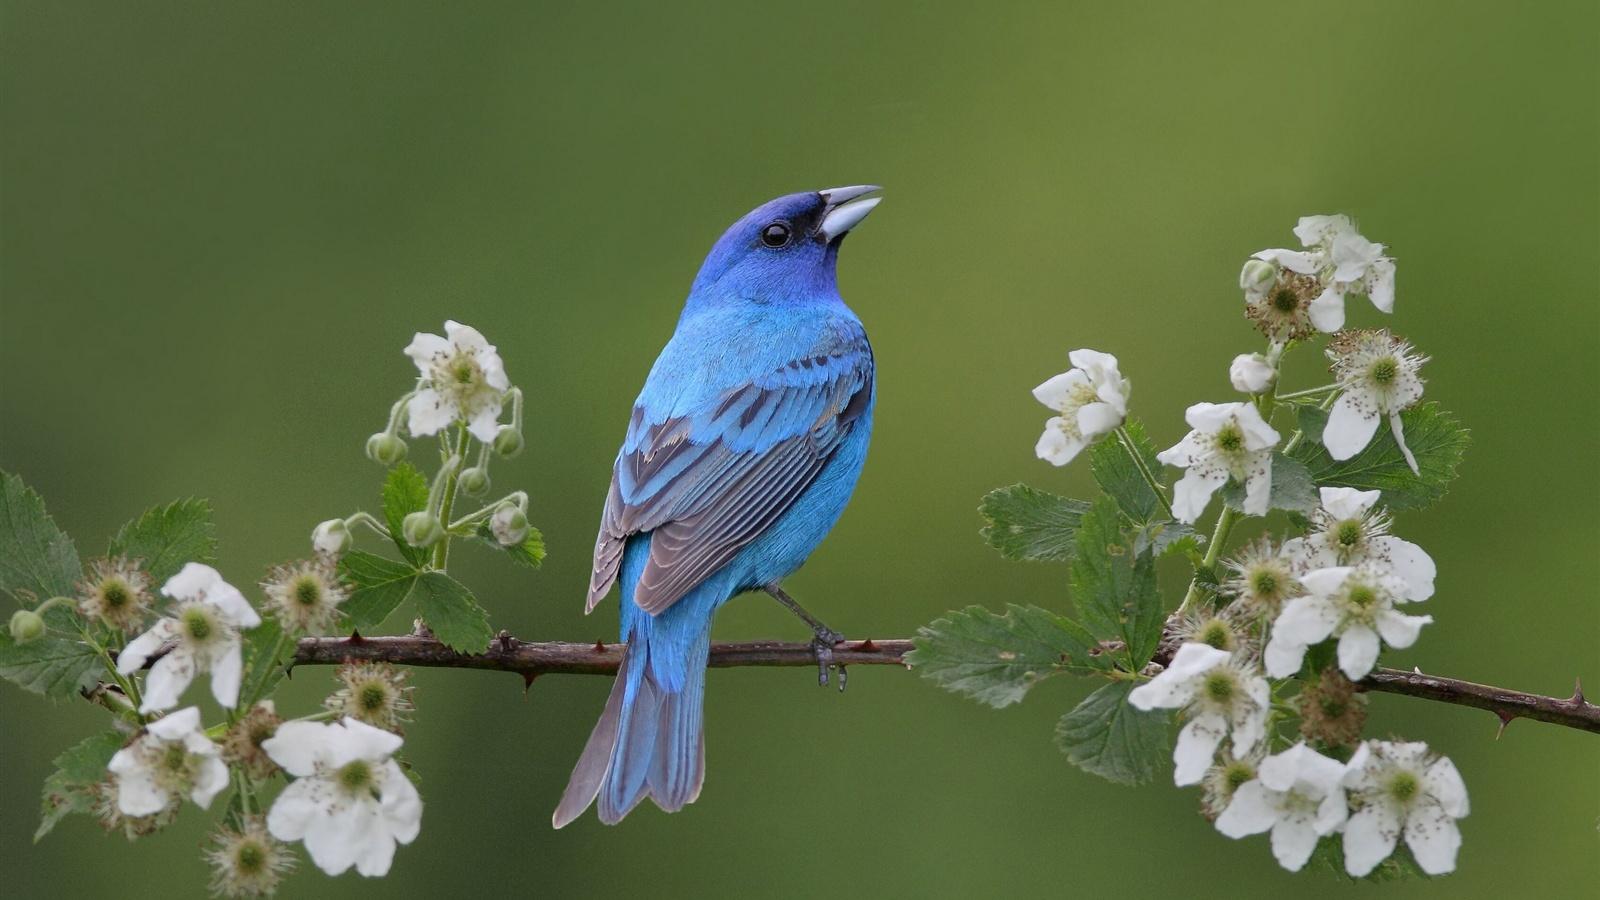 spring bird on a - photo #5